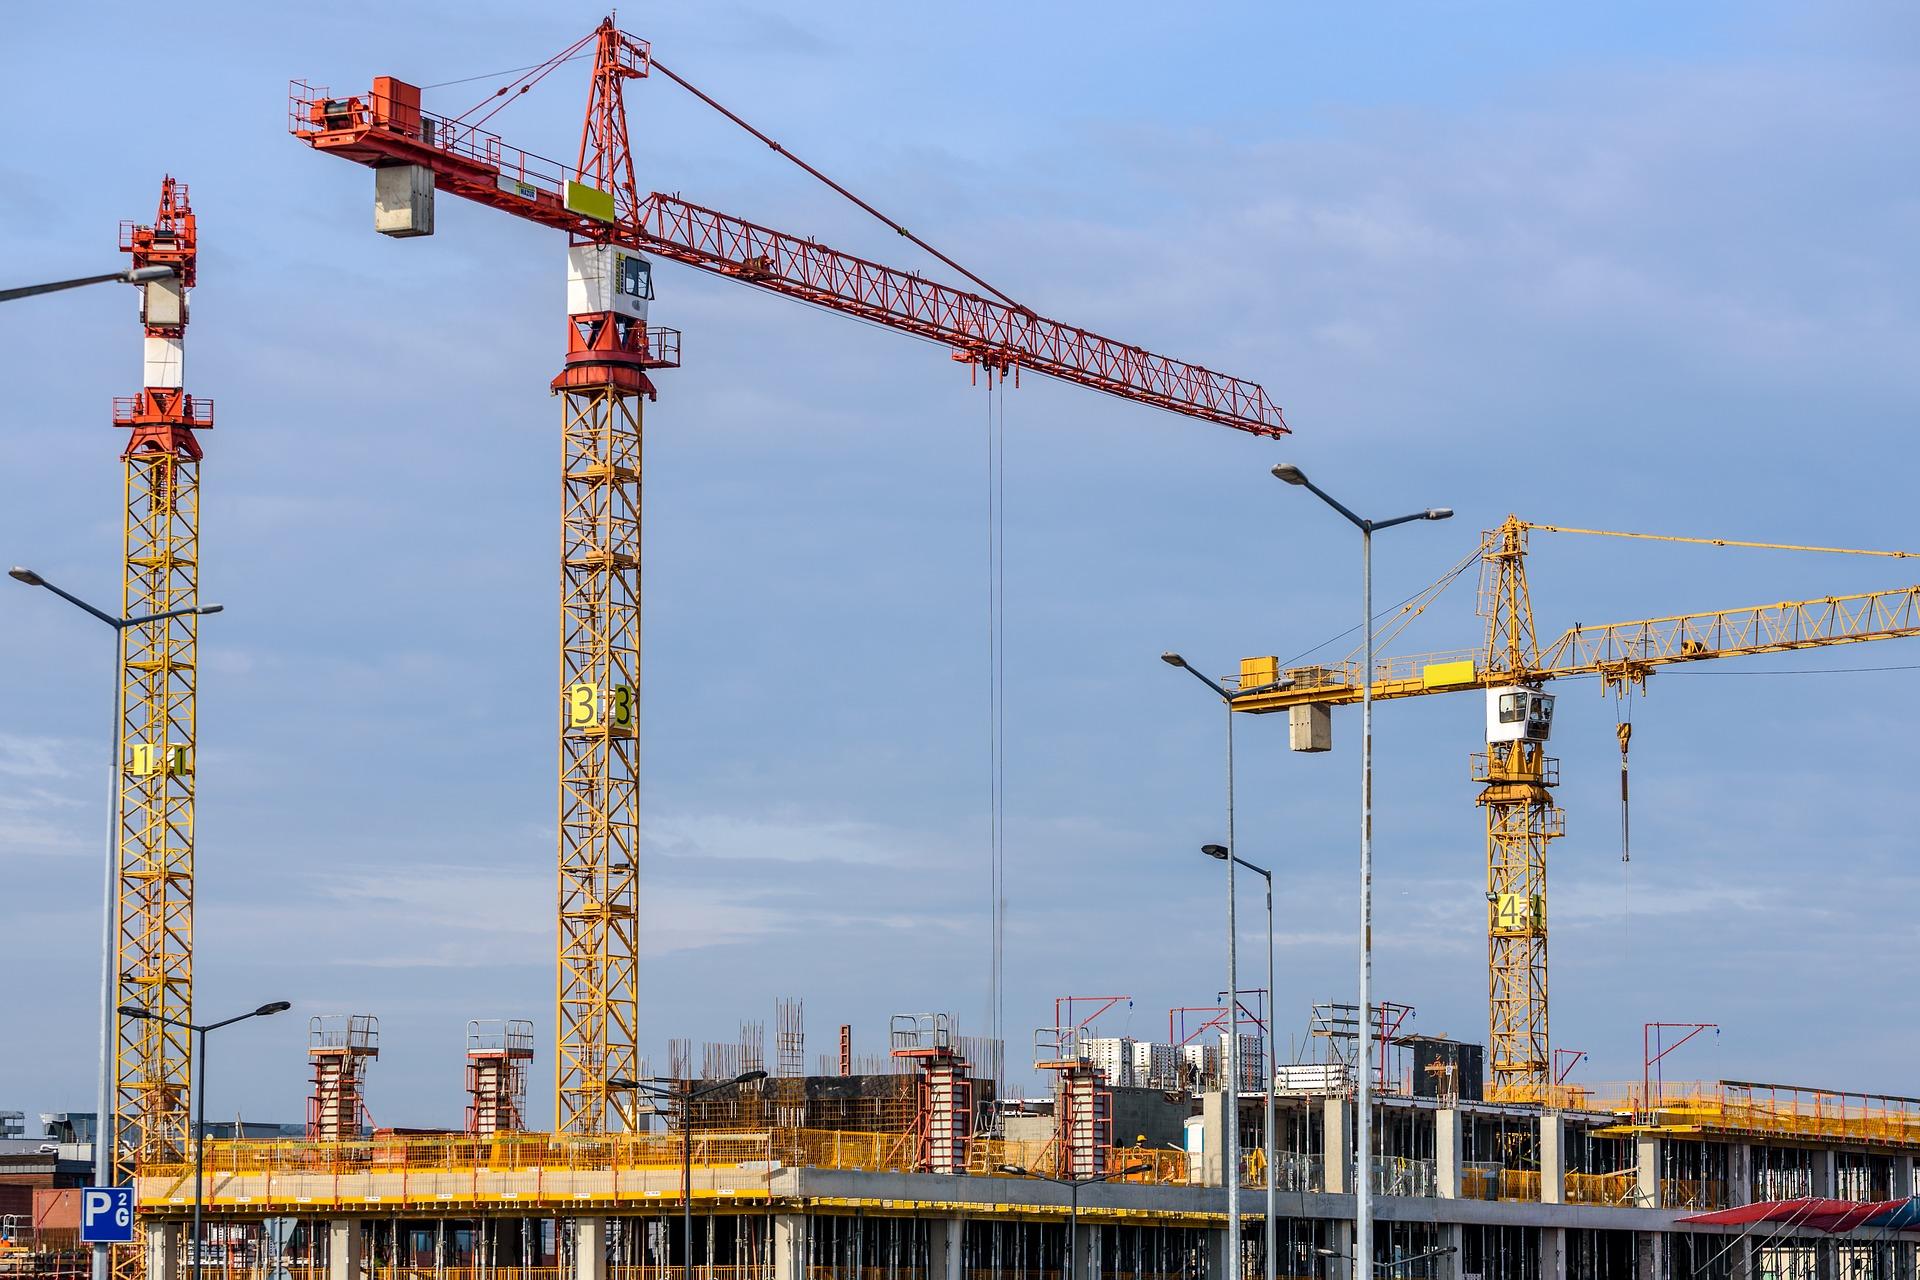 building-1804030_1920.jpg